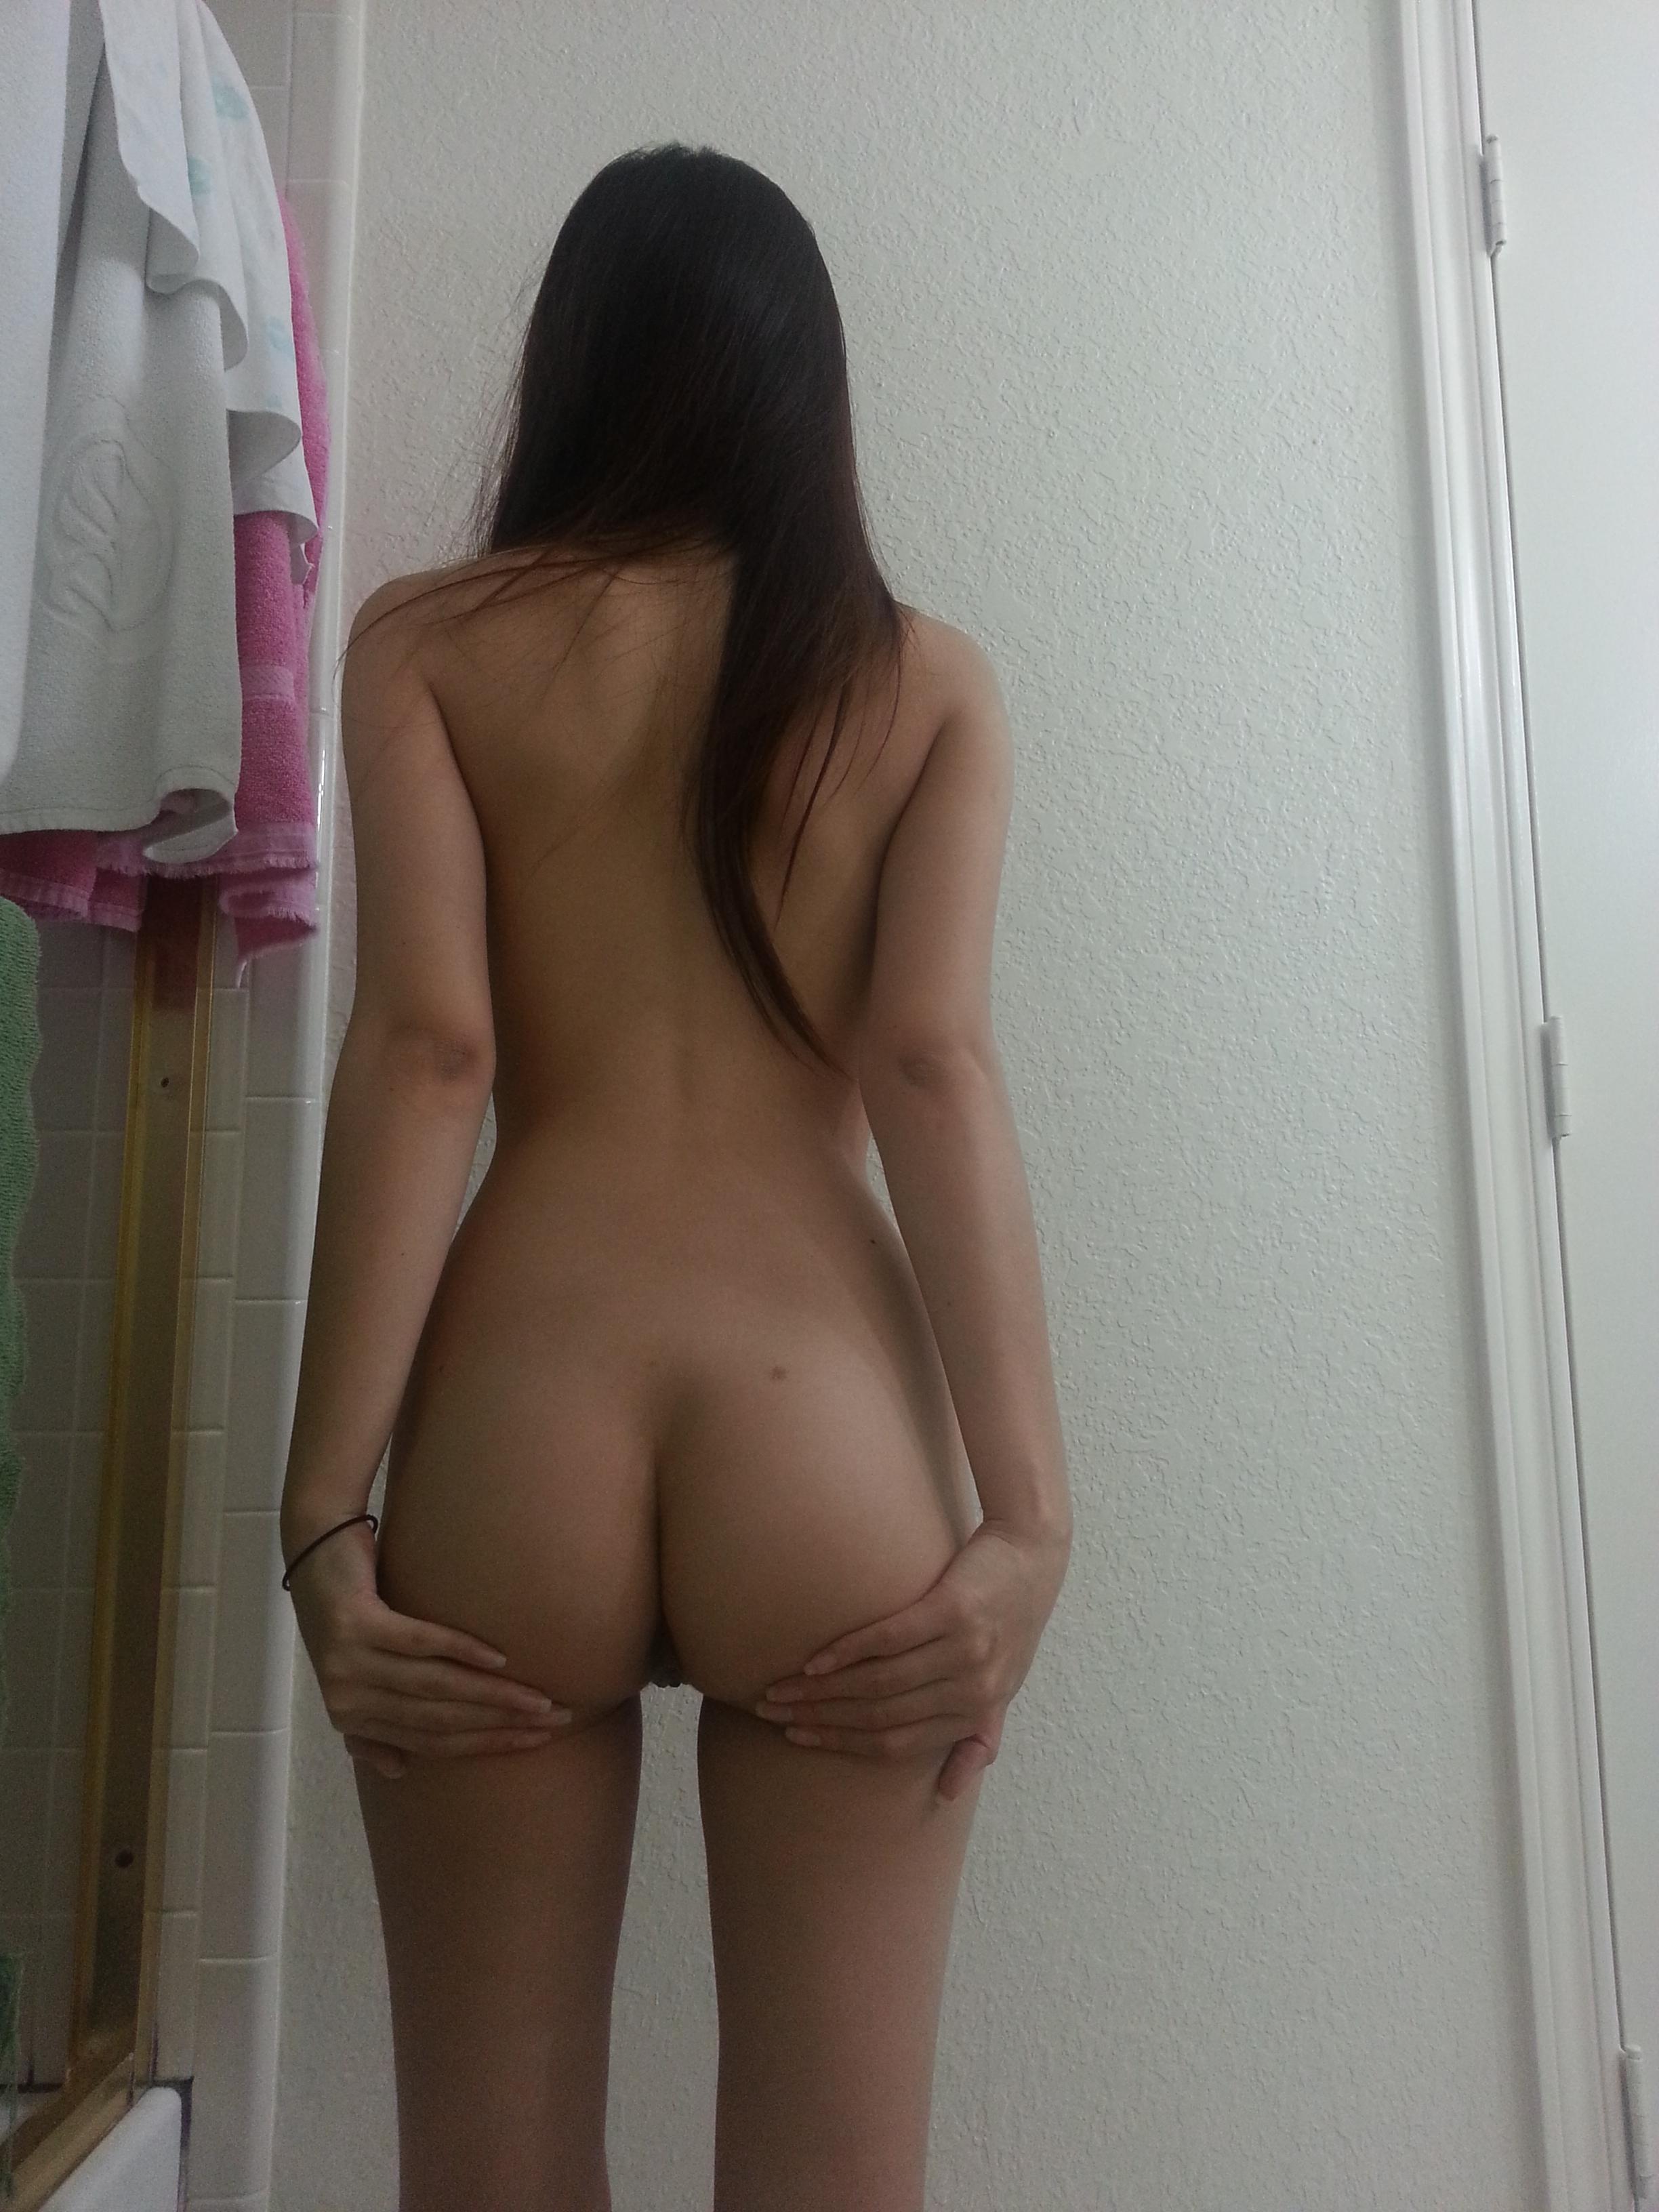 ex-girlfriend-nude-amateurs-girls-private-photo-mix-vol4-03